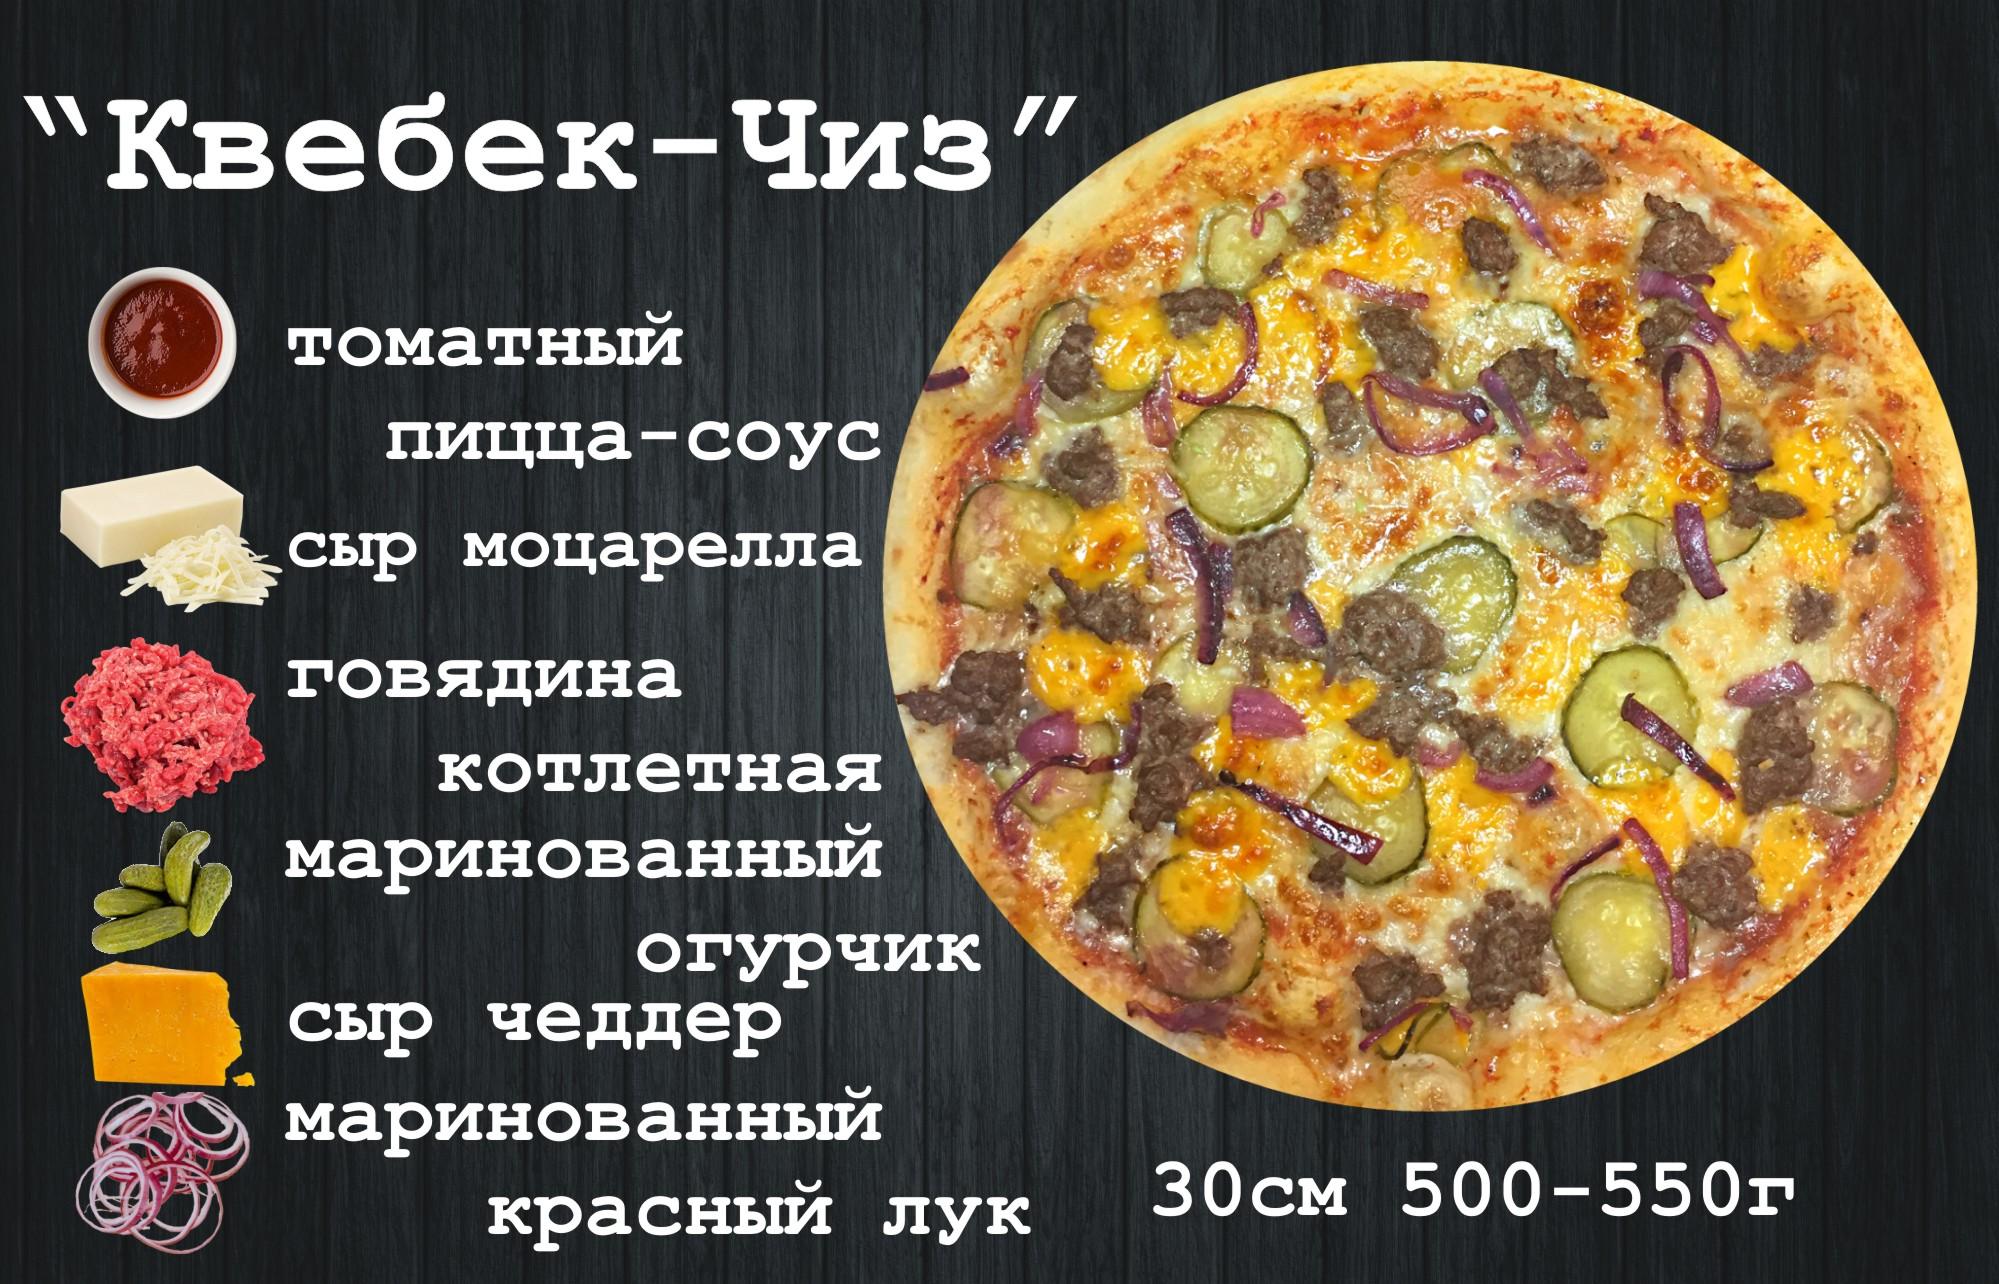 Квебек_чиз_pizza_urbanfood_minsk